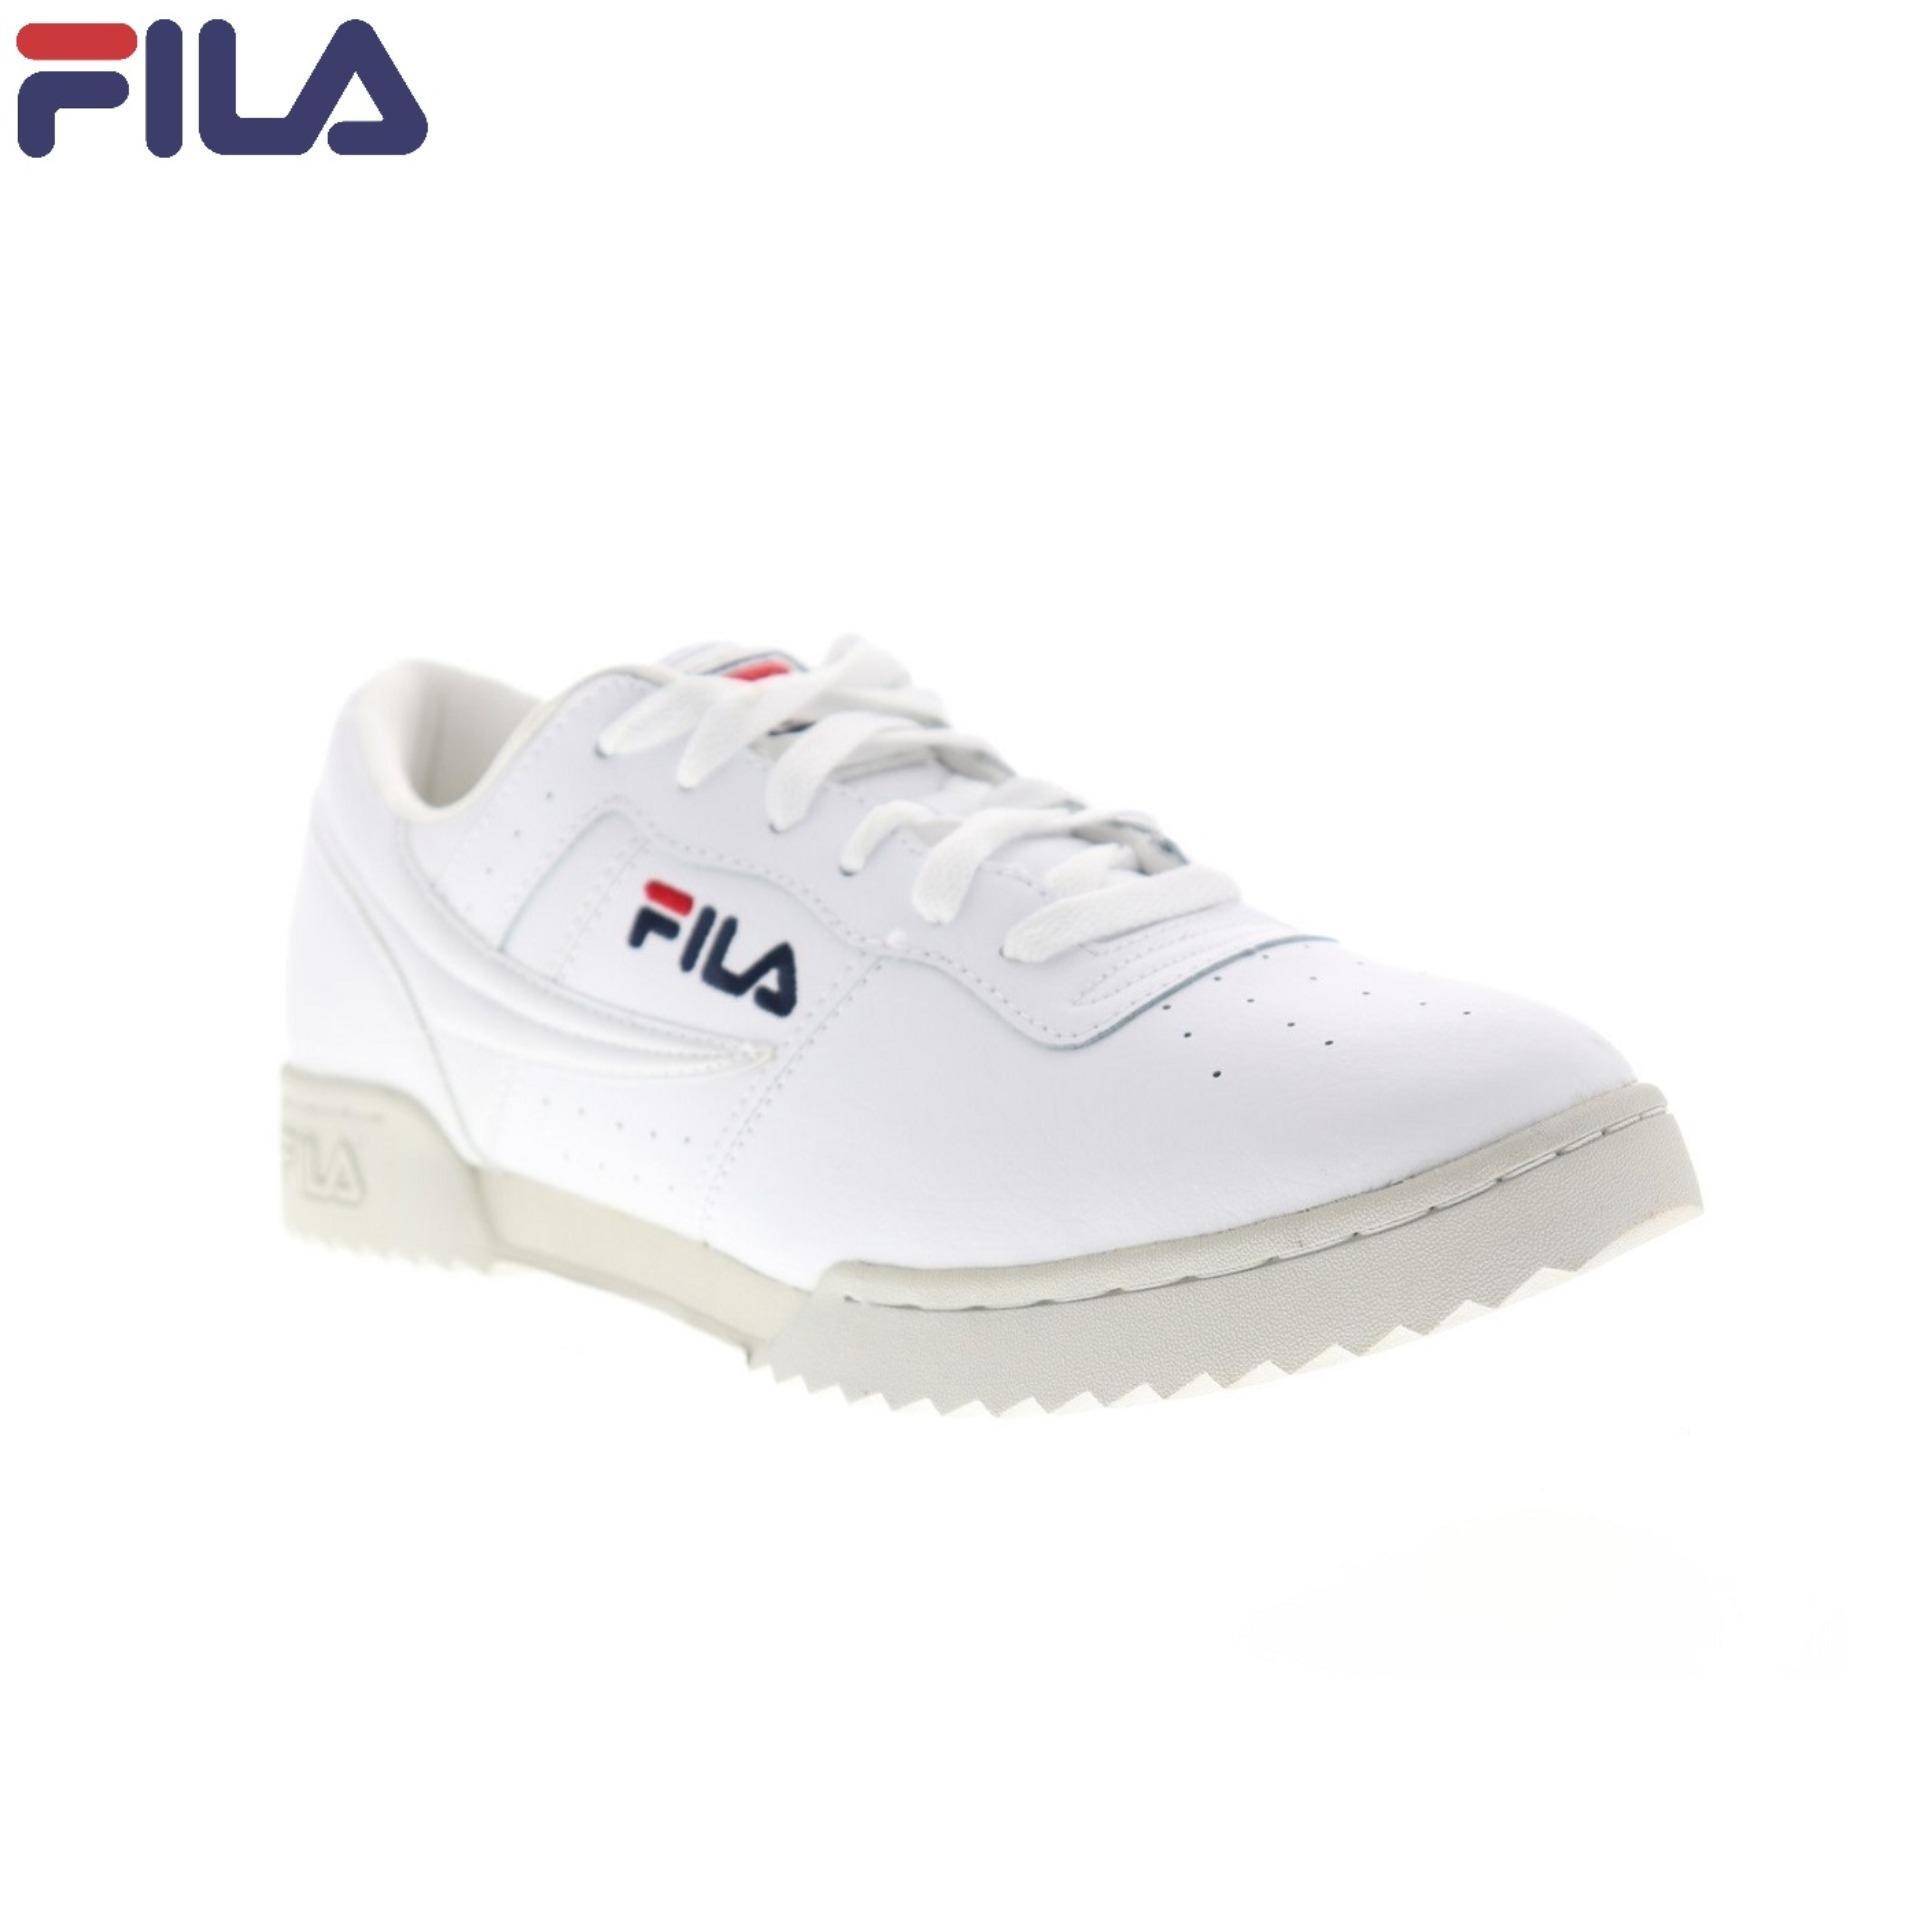 fd0a90dd99 Fila Original Fitness Ripple Men White-1FM00068-109